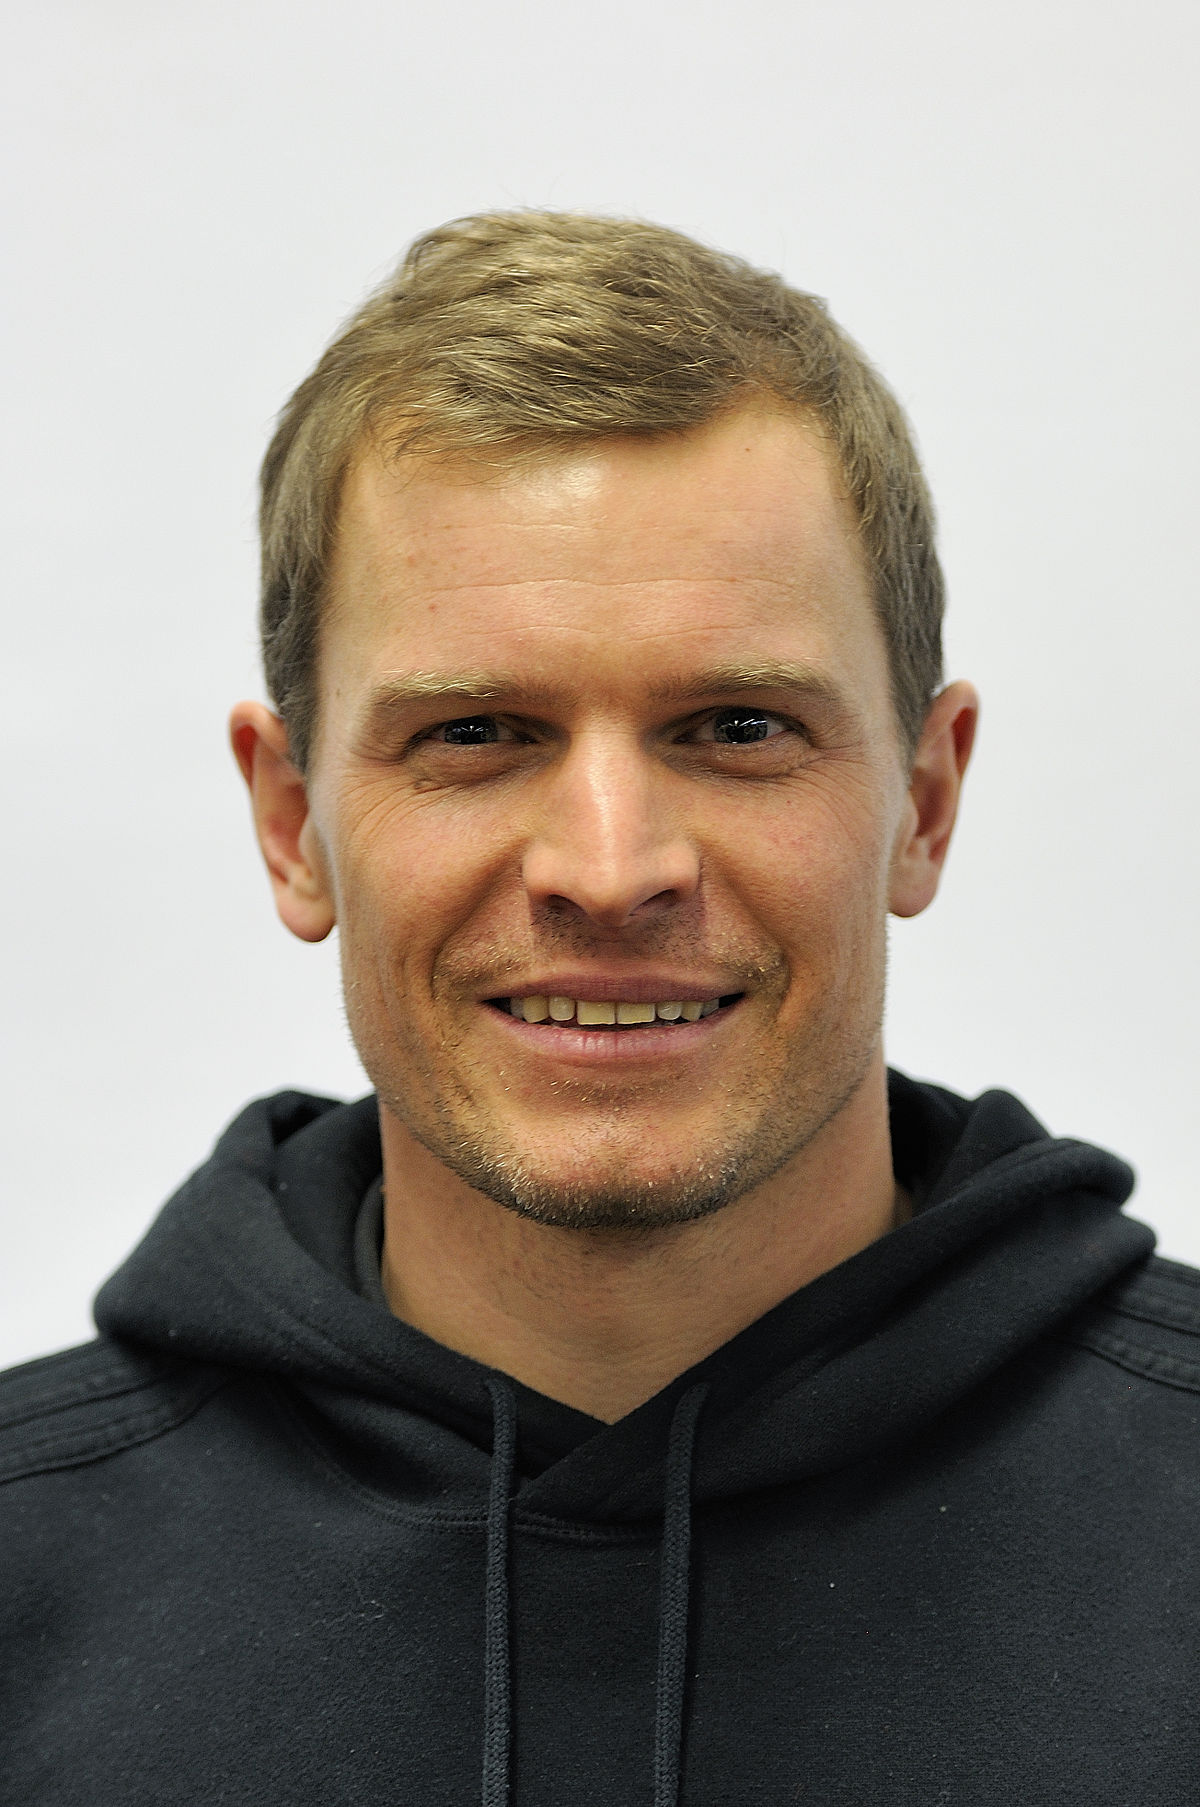 Tobias Angerer - Wikipedia